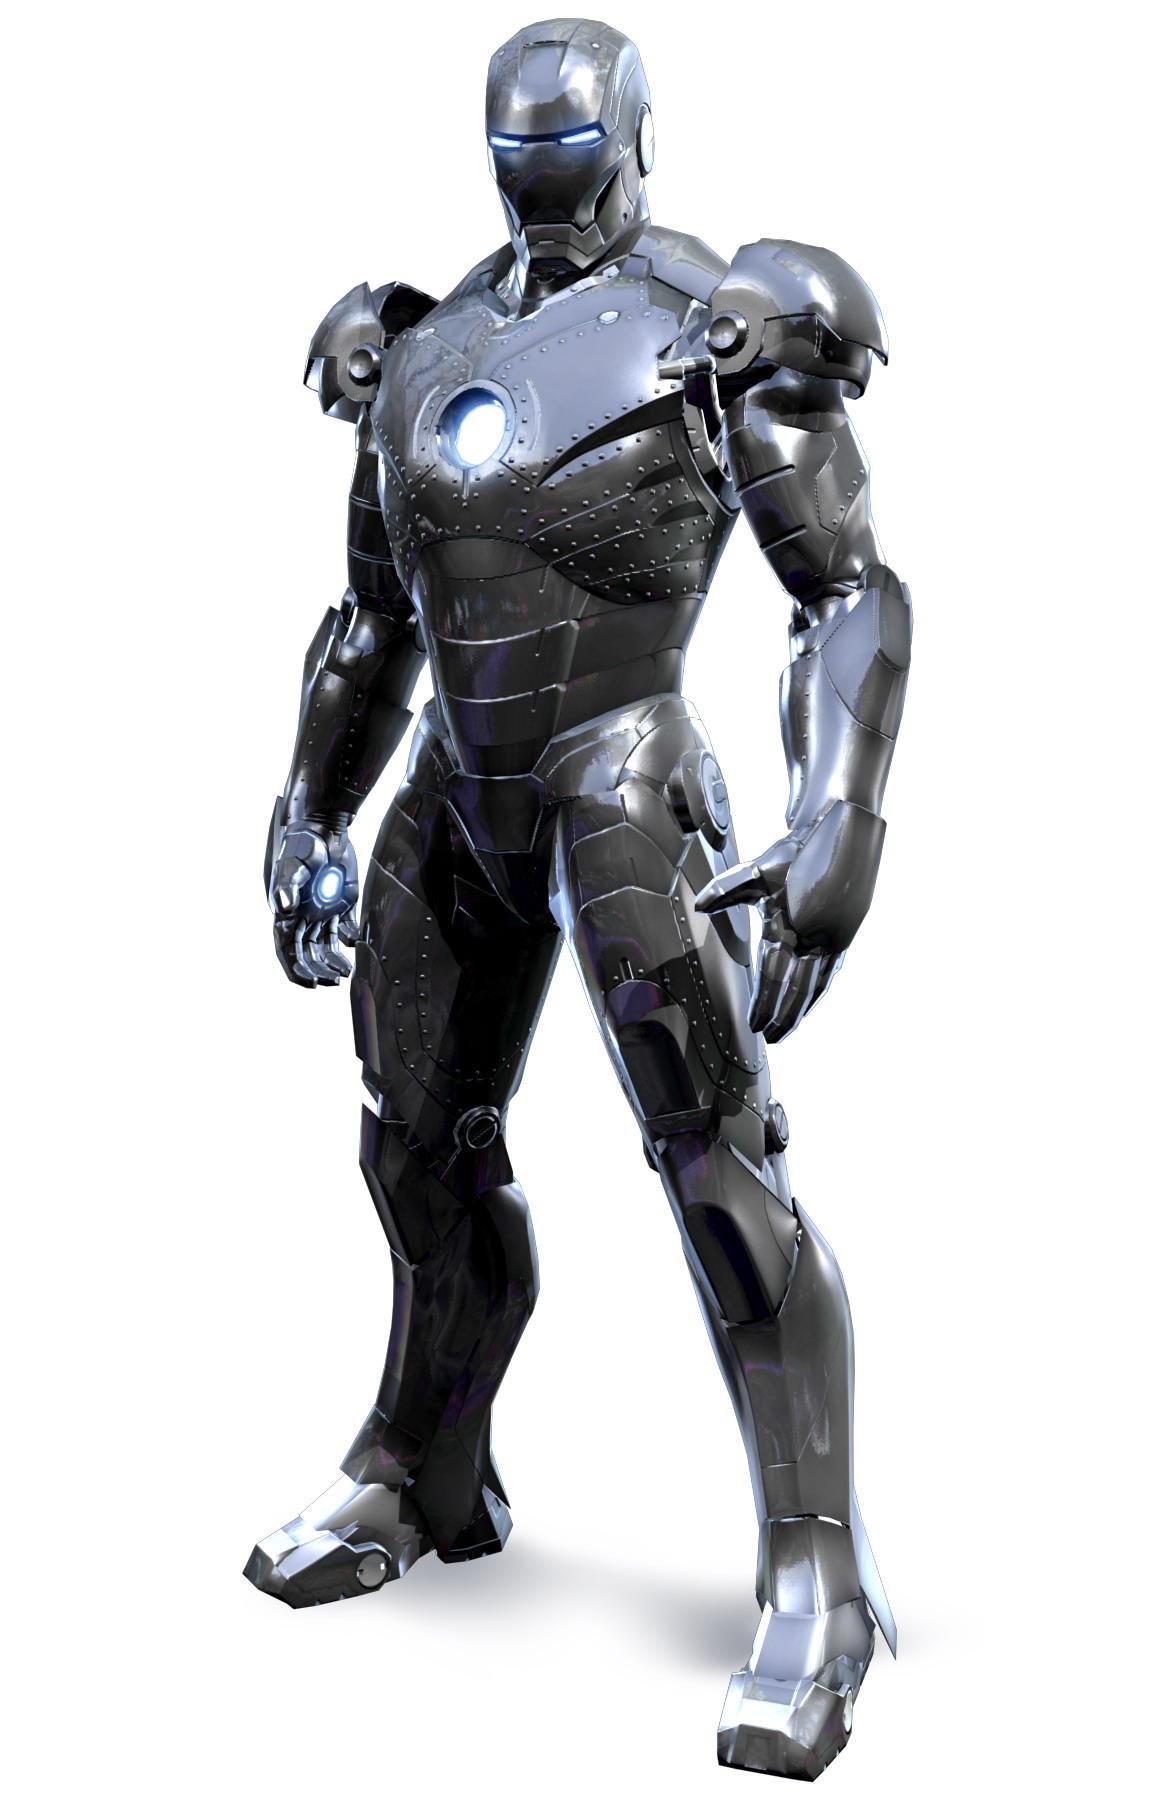 mark ii | iron man wiki | fandom poweredwikia